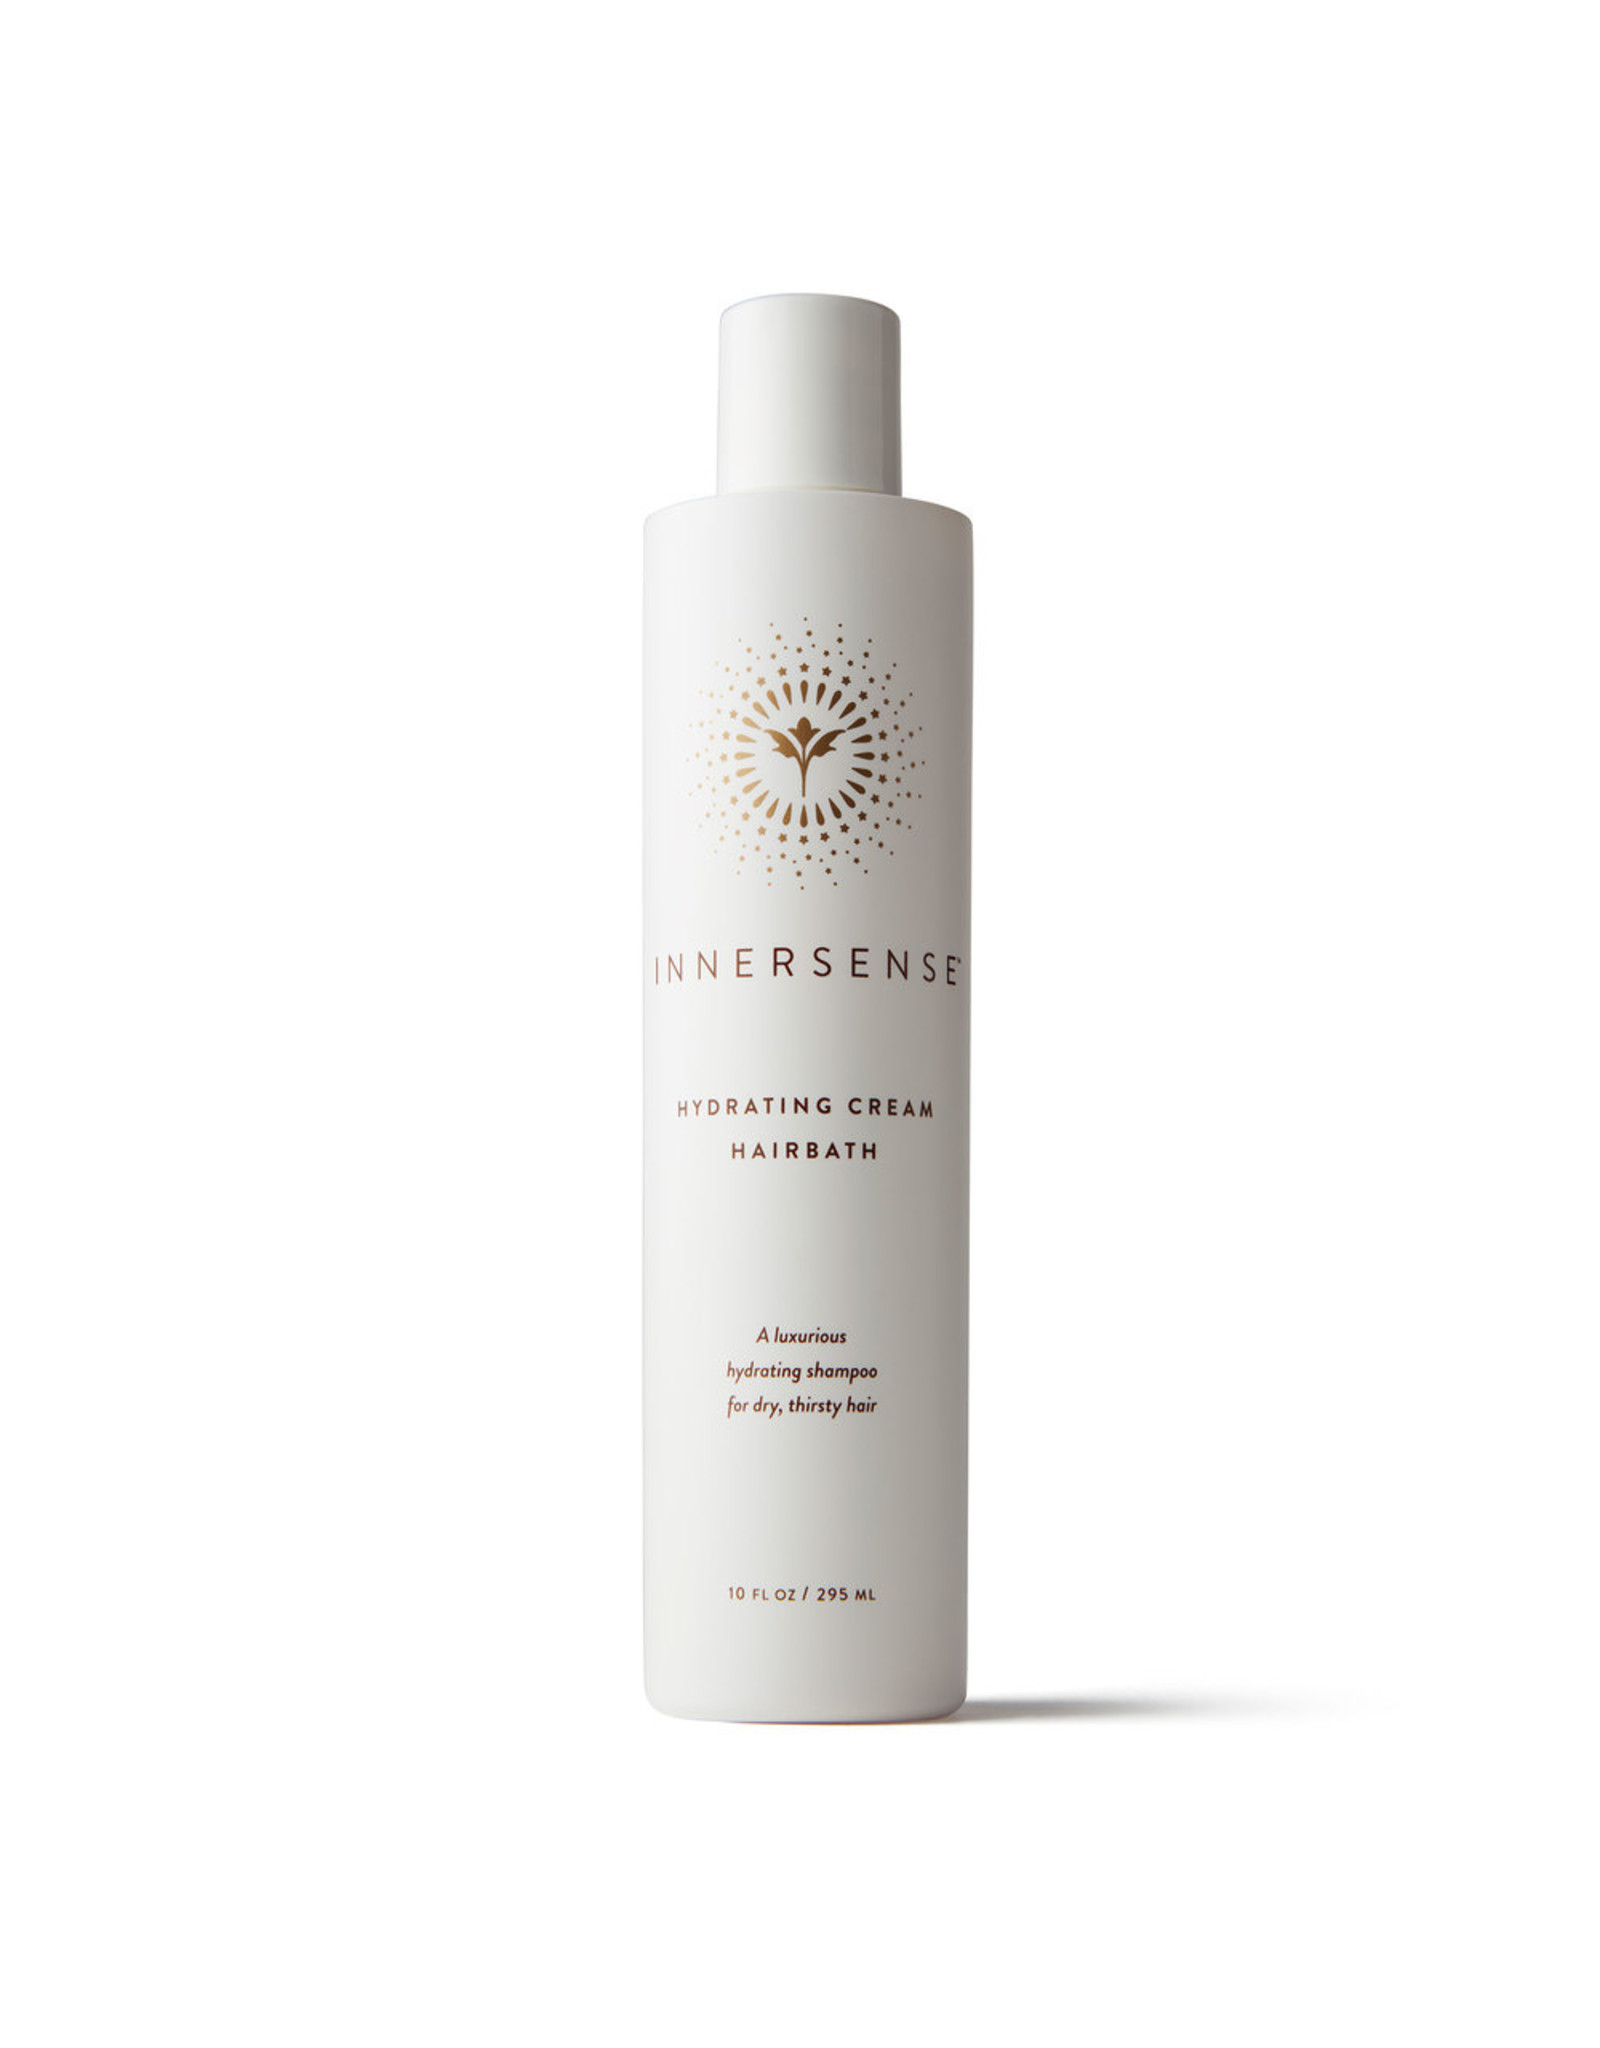 Innersense Innersense Hydrating Cream Hairbath- Travel Size